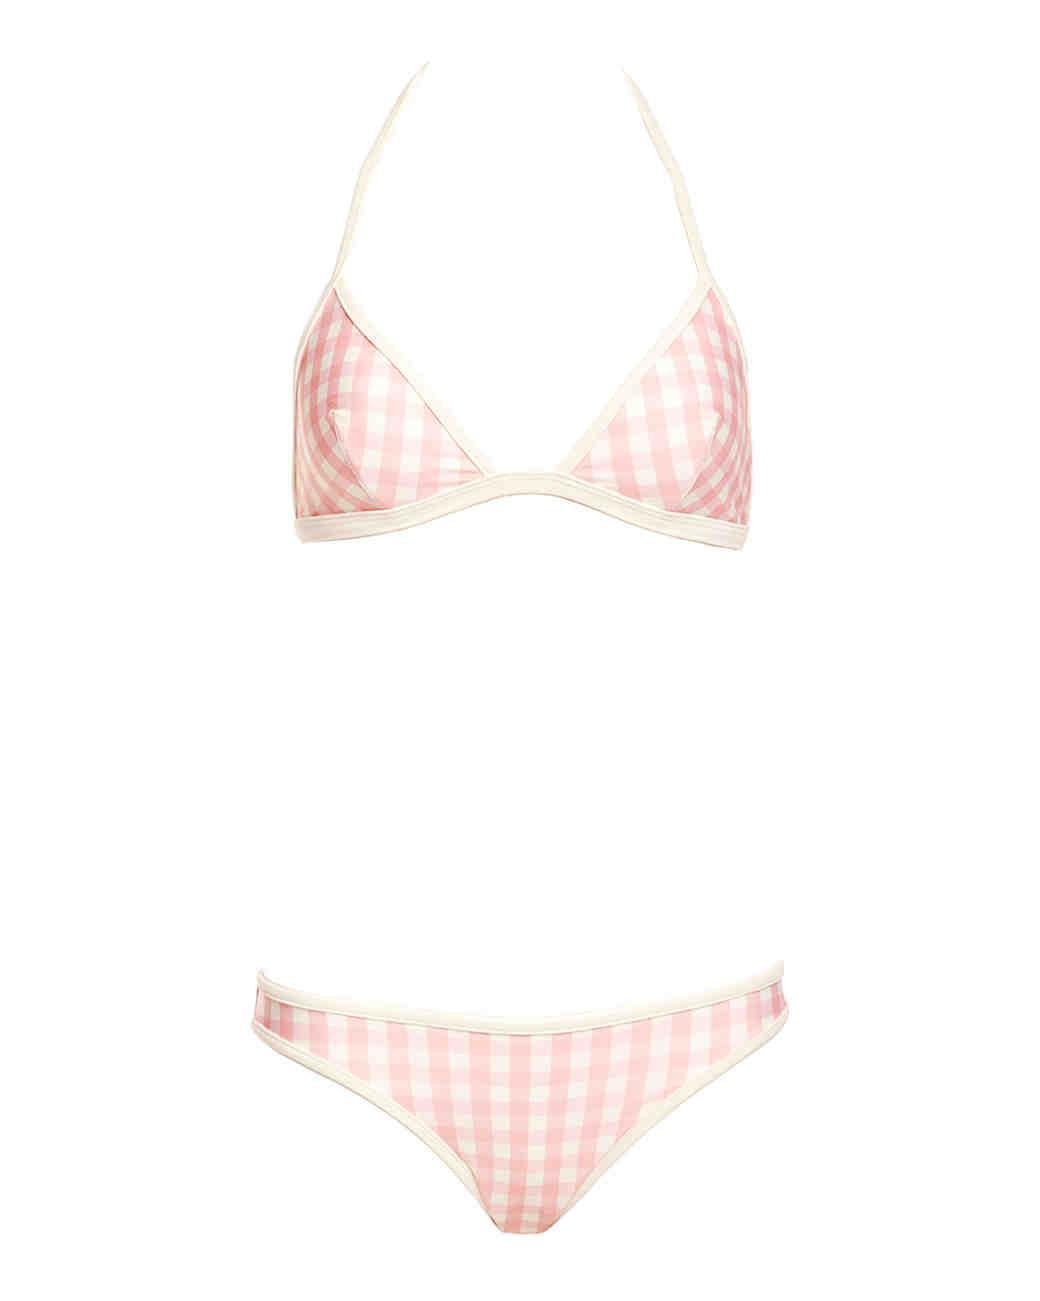 solid-striped-the-miranda-pink-gingham-top-88-bottom-88.jpg